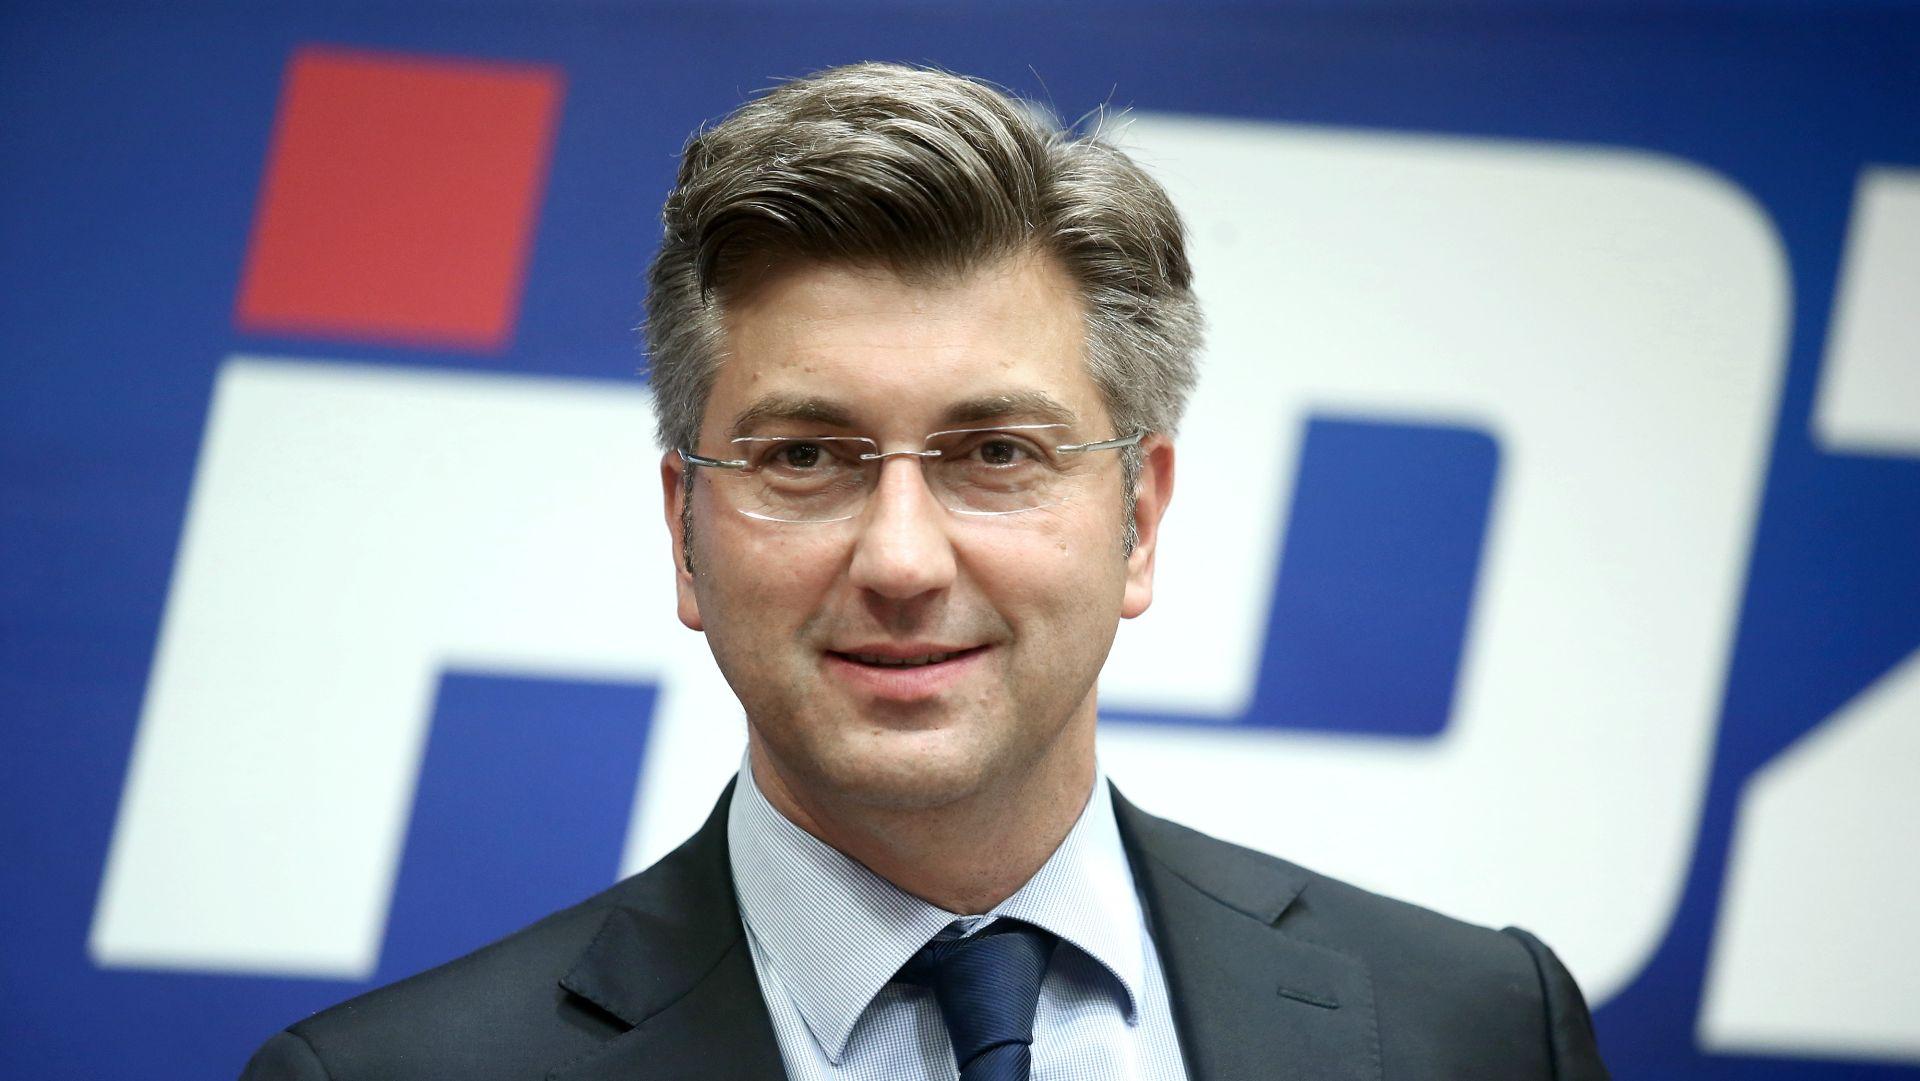 Plenković u Mostaru: Strateški interes RH položaj Hrvata i europska BiH, Milanovićeva izjava štetna